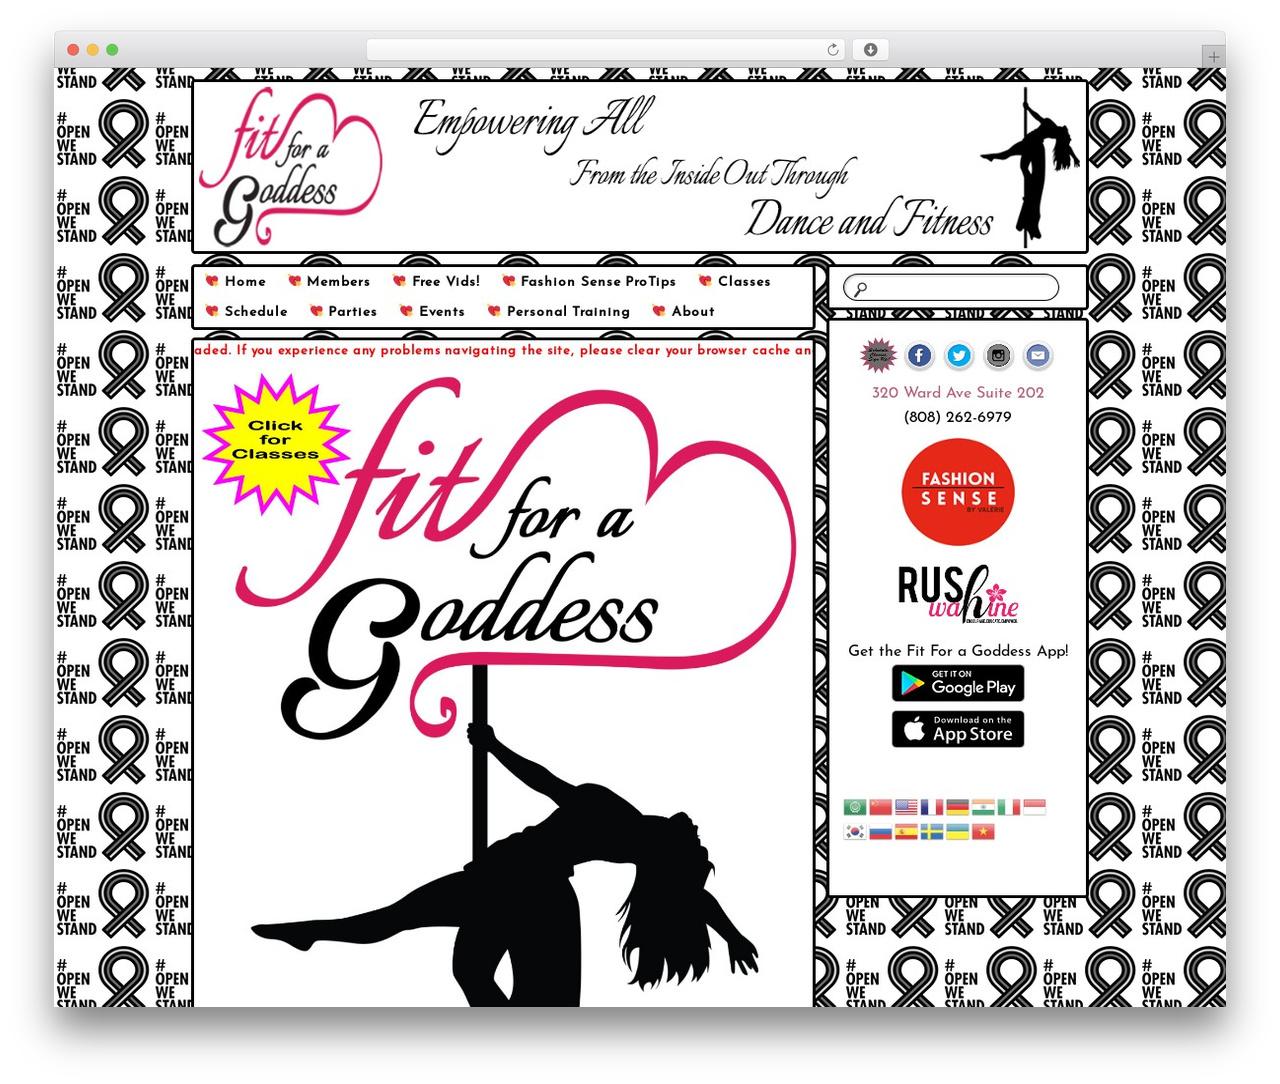 Bouquet fitness WordPress theme - fitforagoddess.com